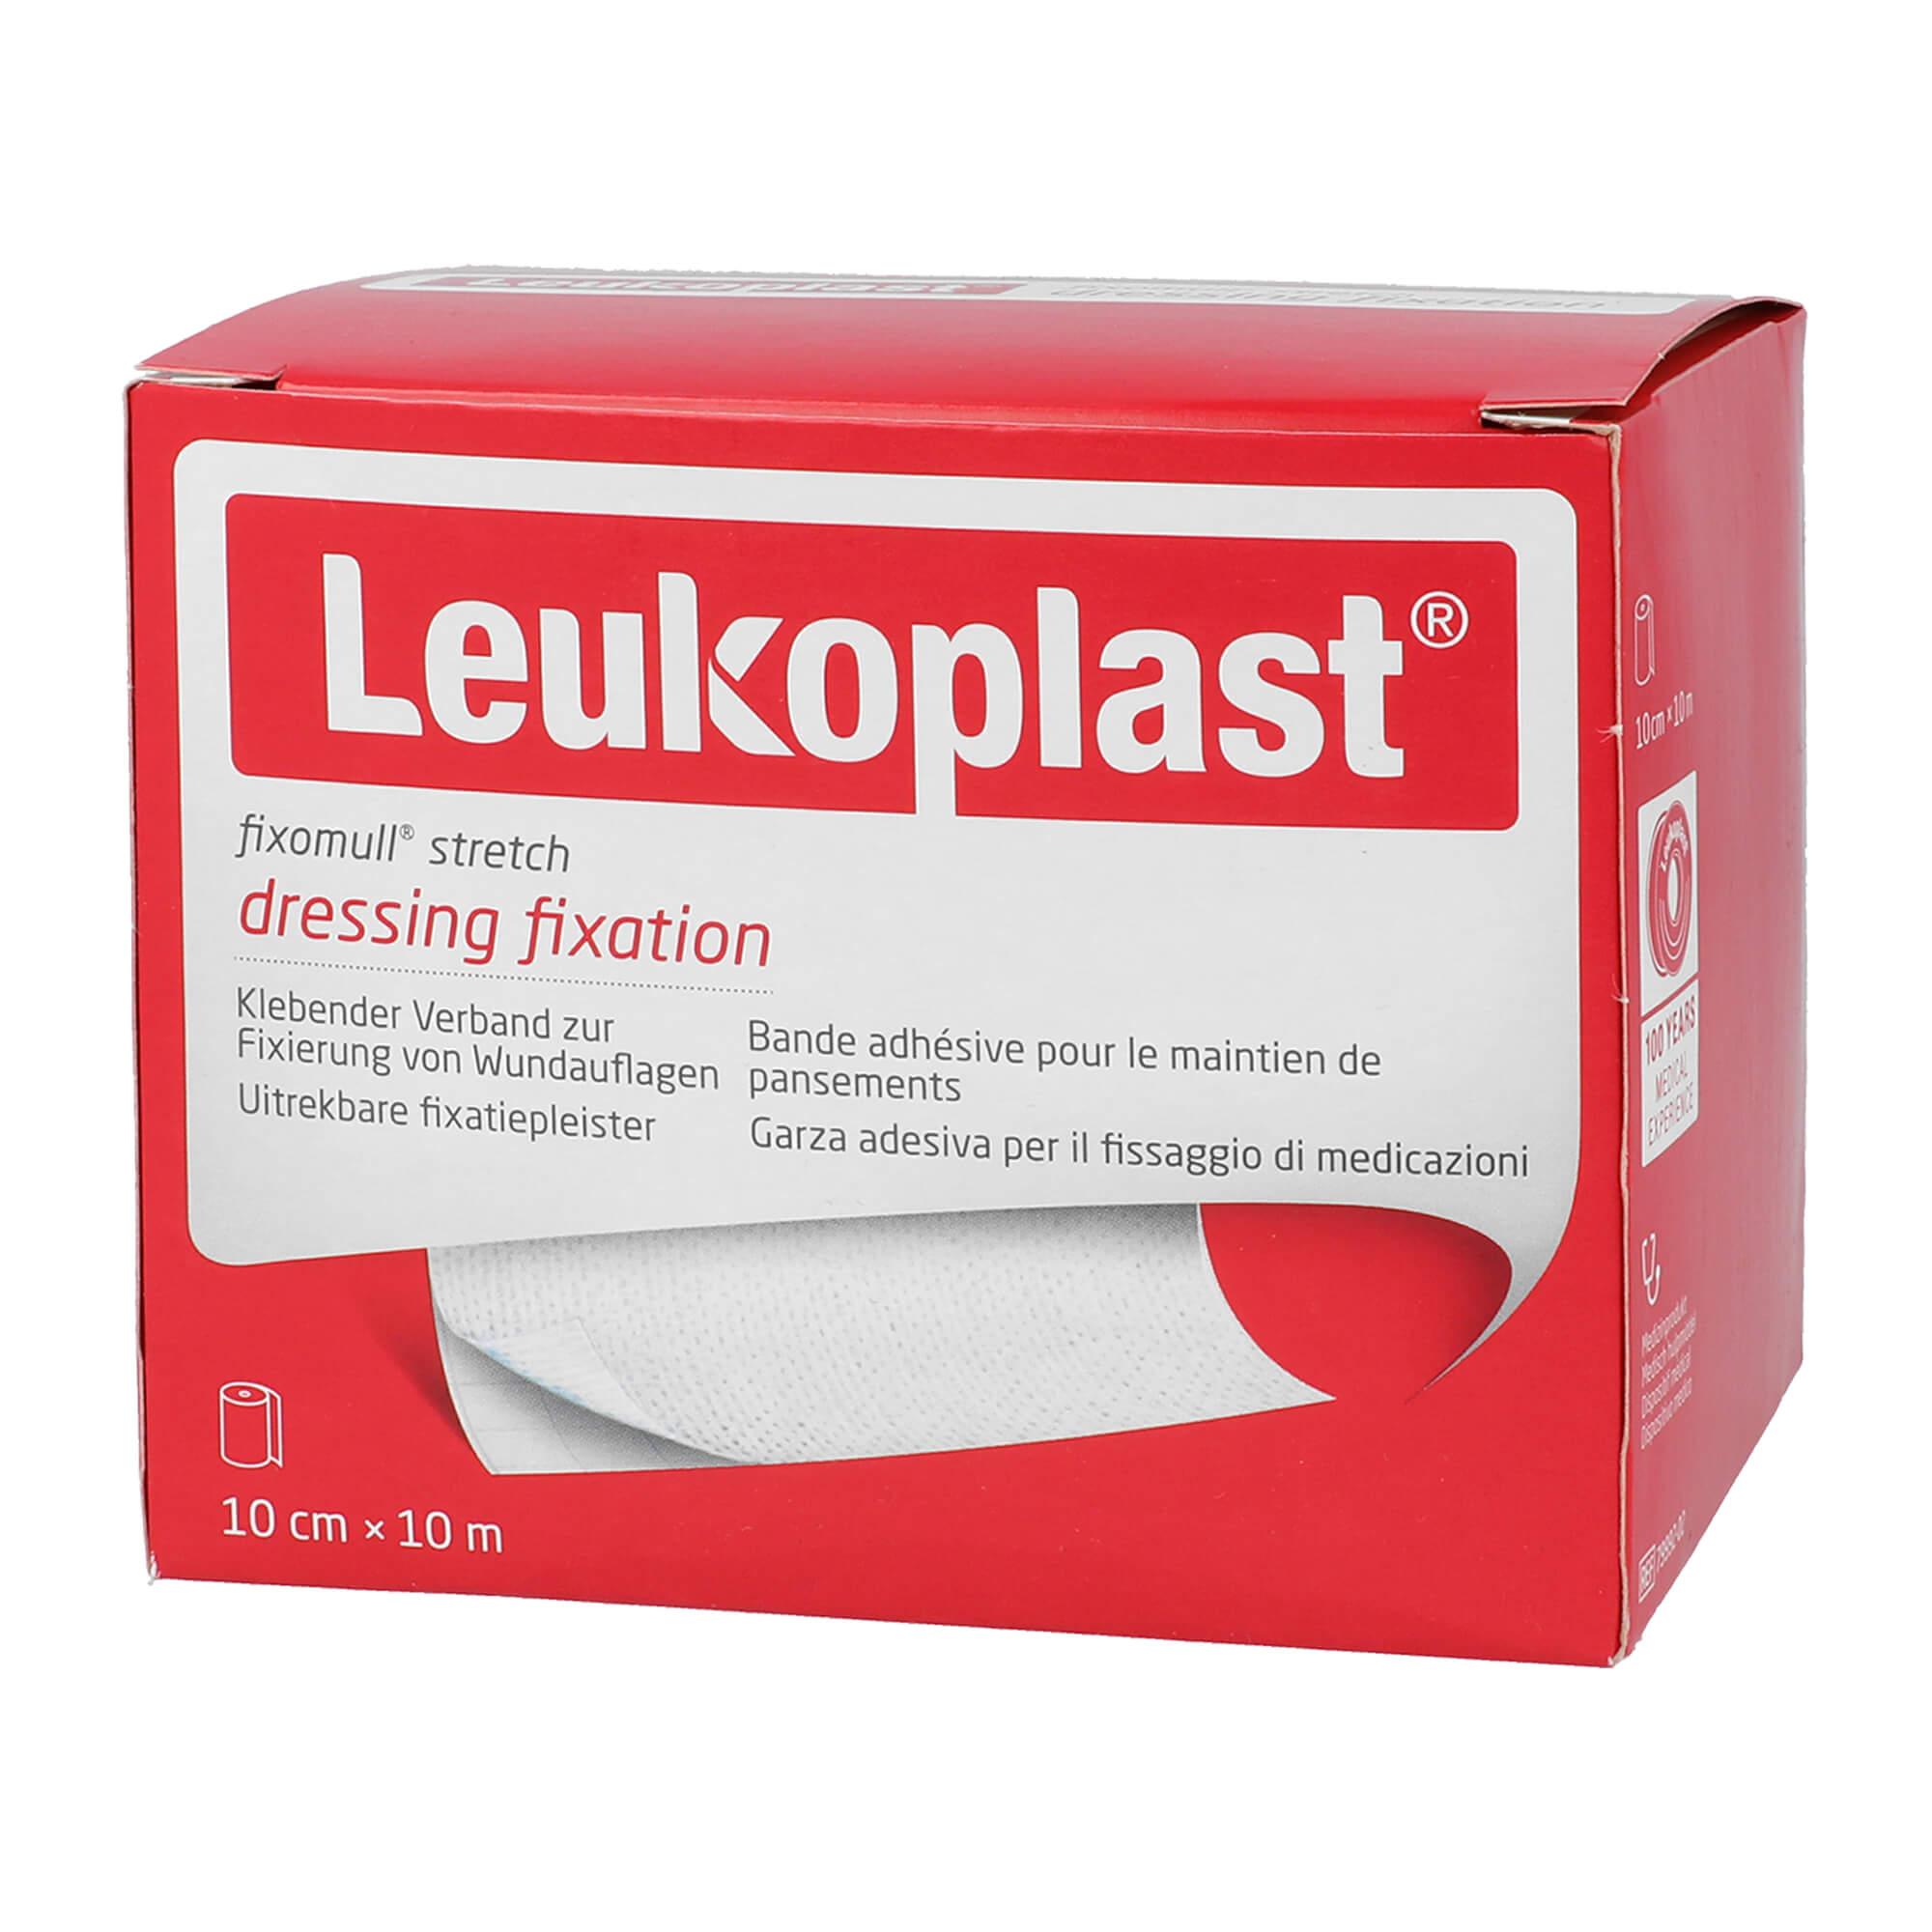 Leukoplast Fixomull stretch 10 cm x 10 m